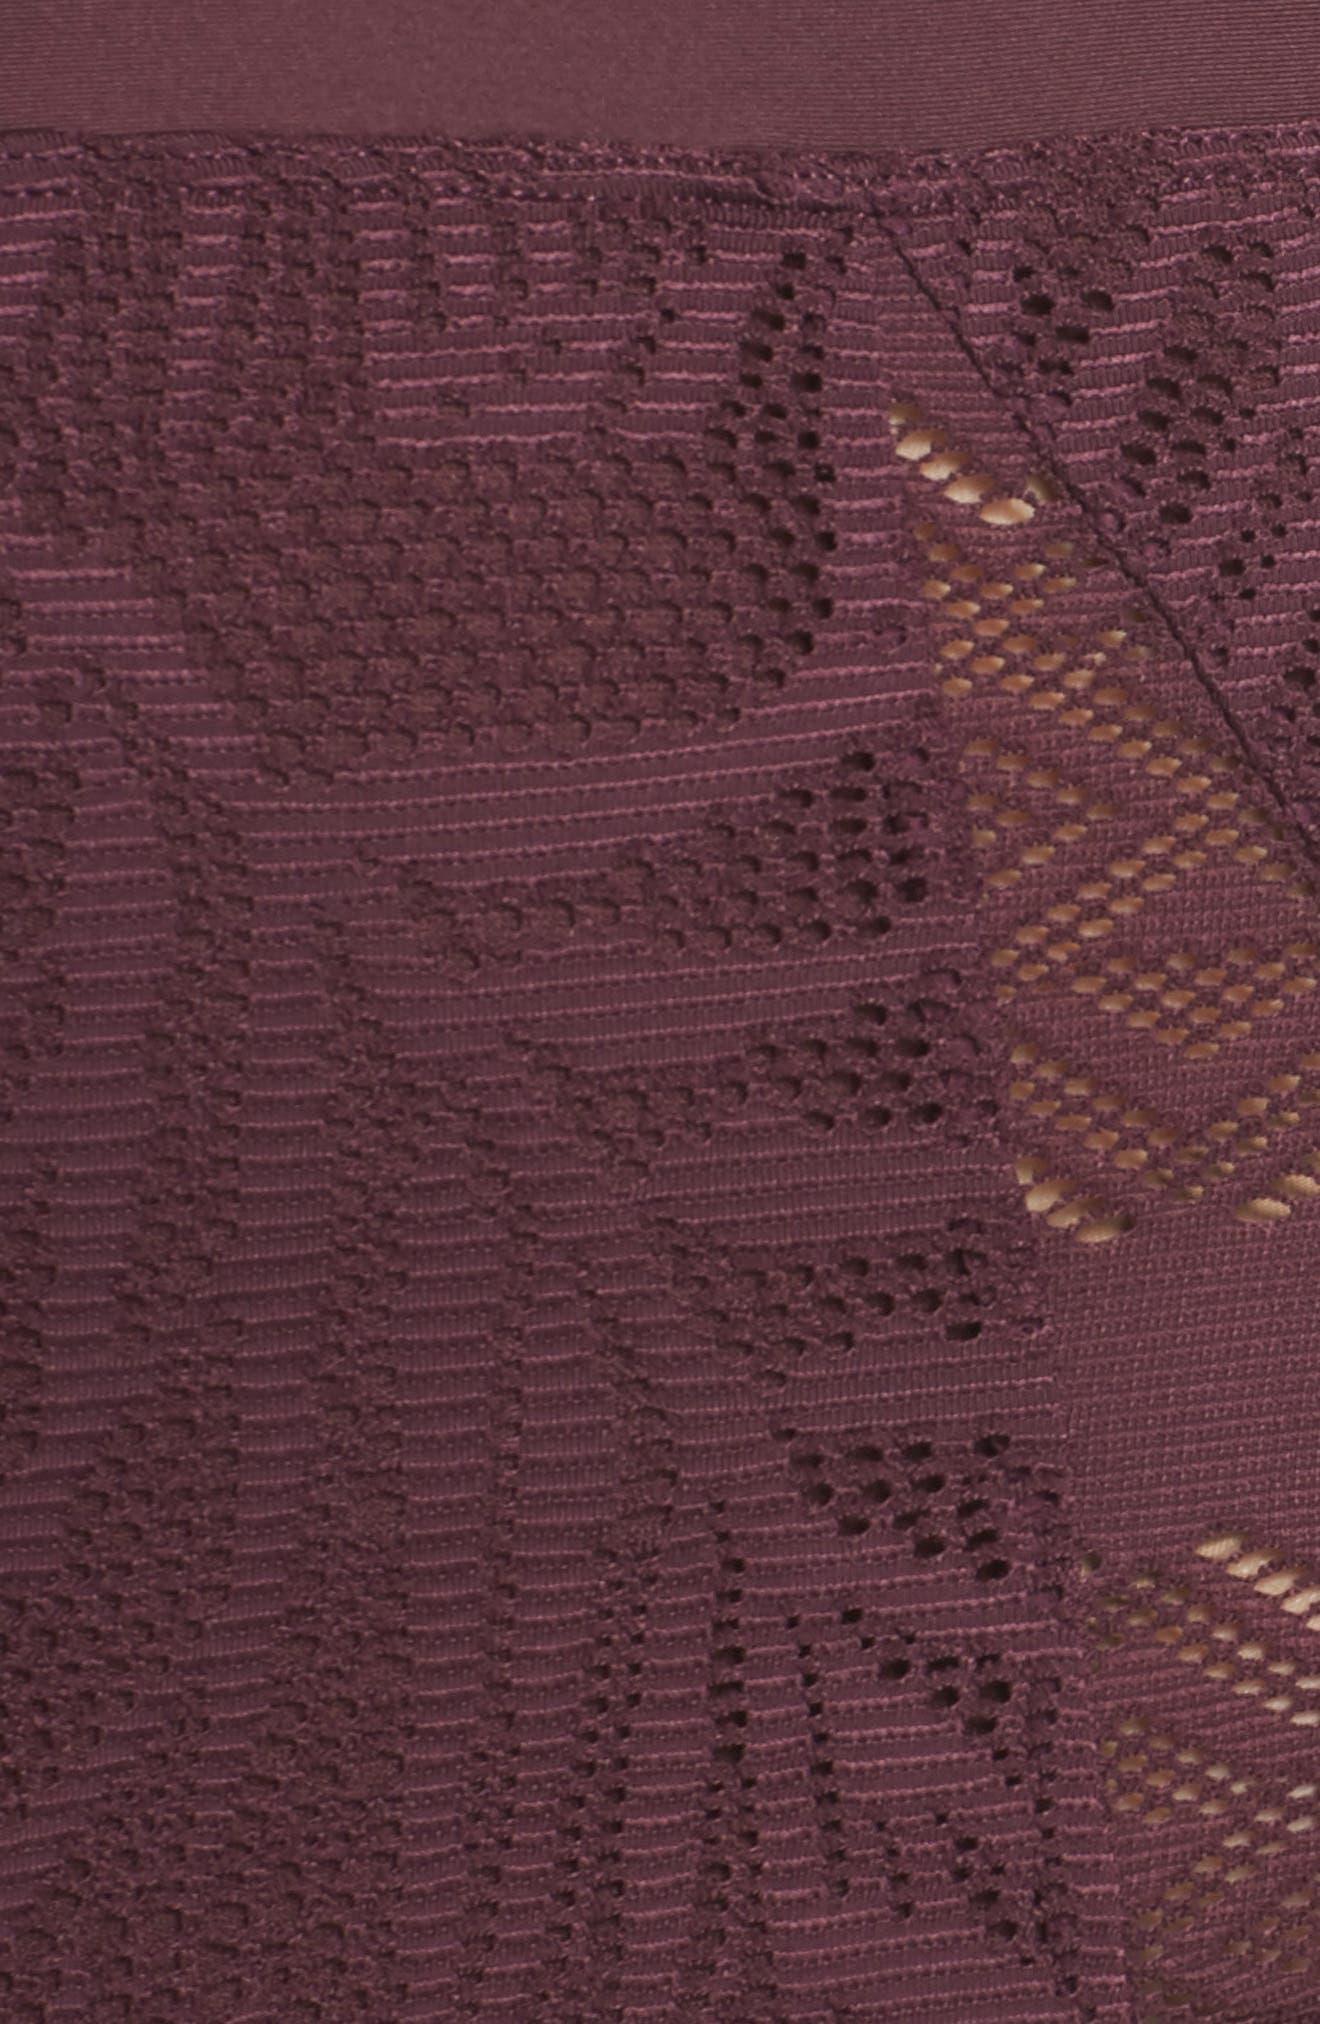 Crochet Inset High Waist Bikini Bottoms,                             Alternate thumbnail 5, color,                             Wine